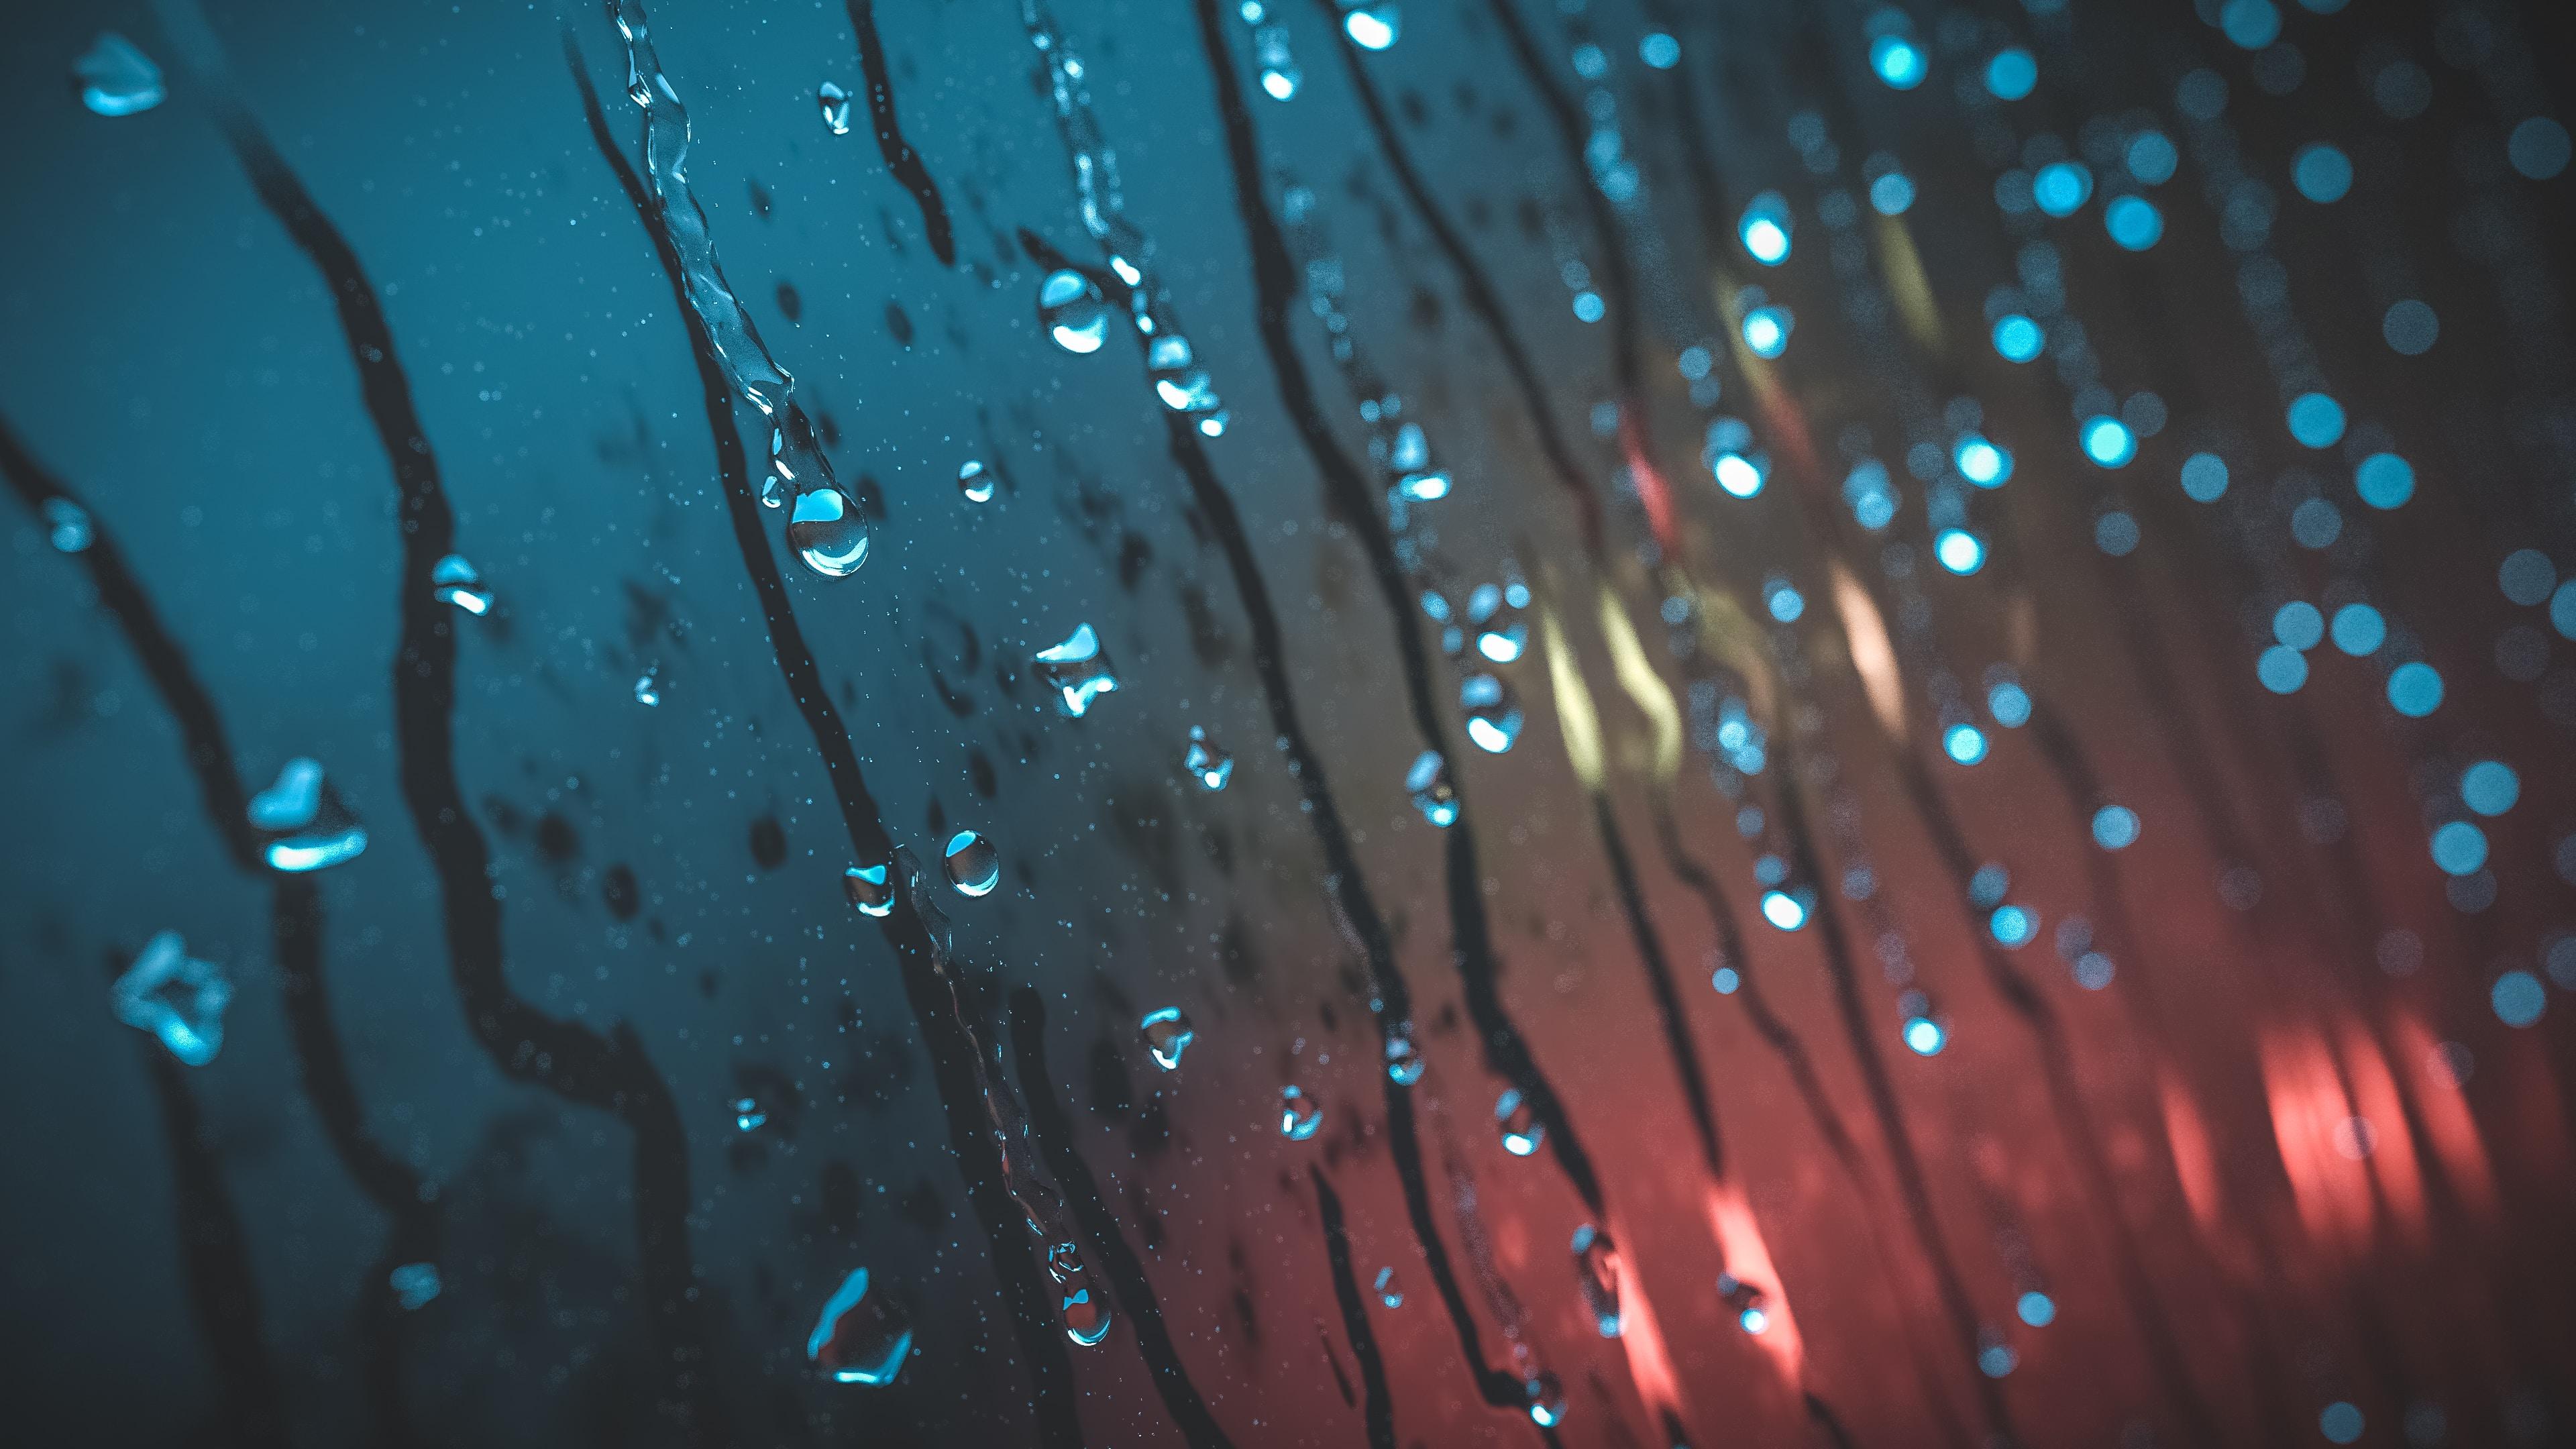 slow-mo photo of rain drops